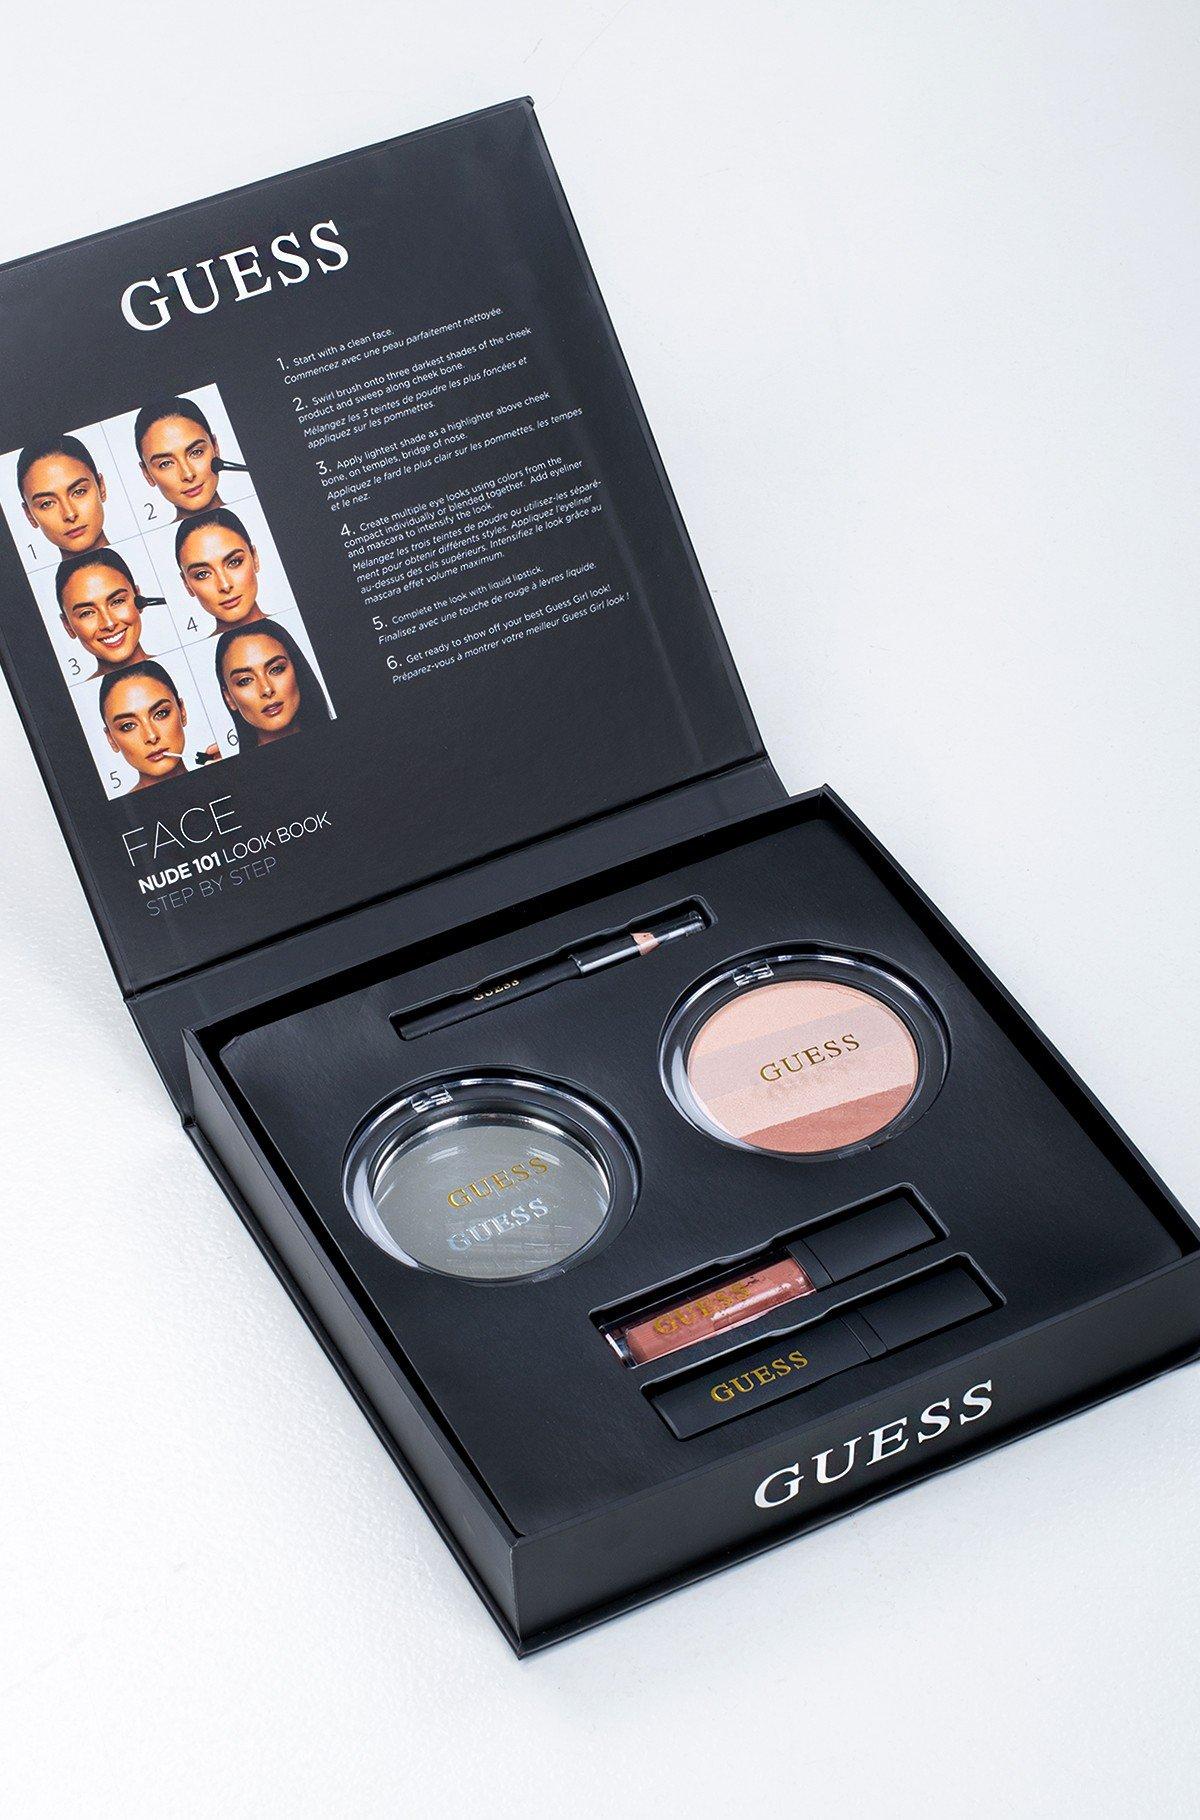 Kosmeetika komplekt Guess Season 1 Nude 101 FACE KIT-full-2